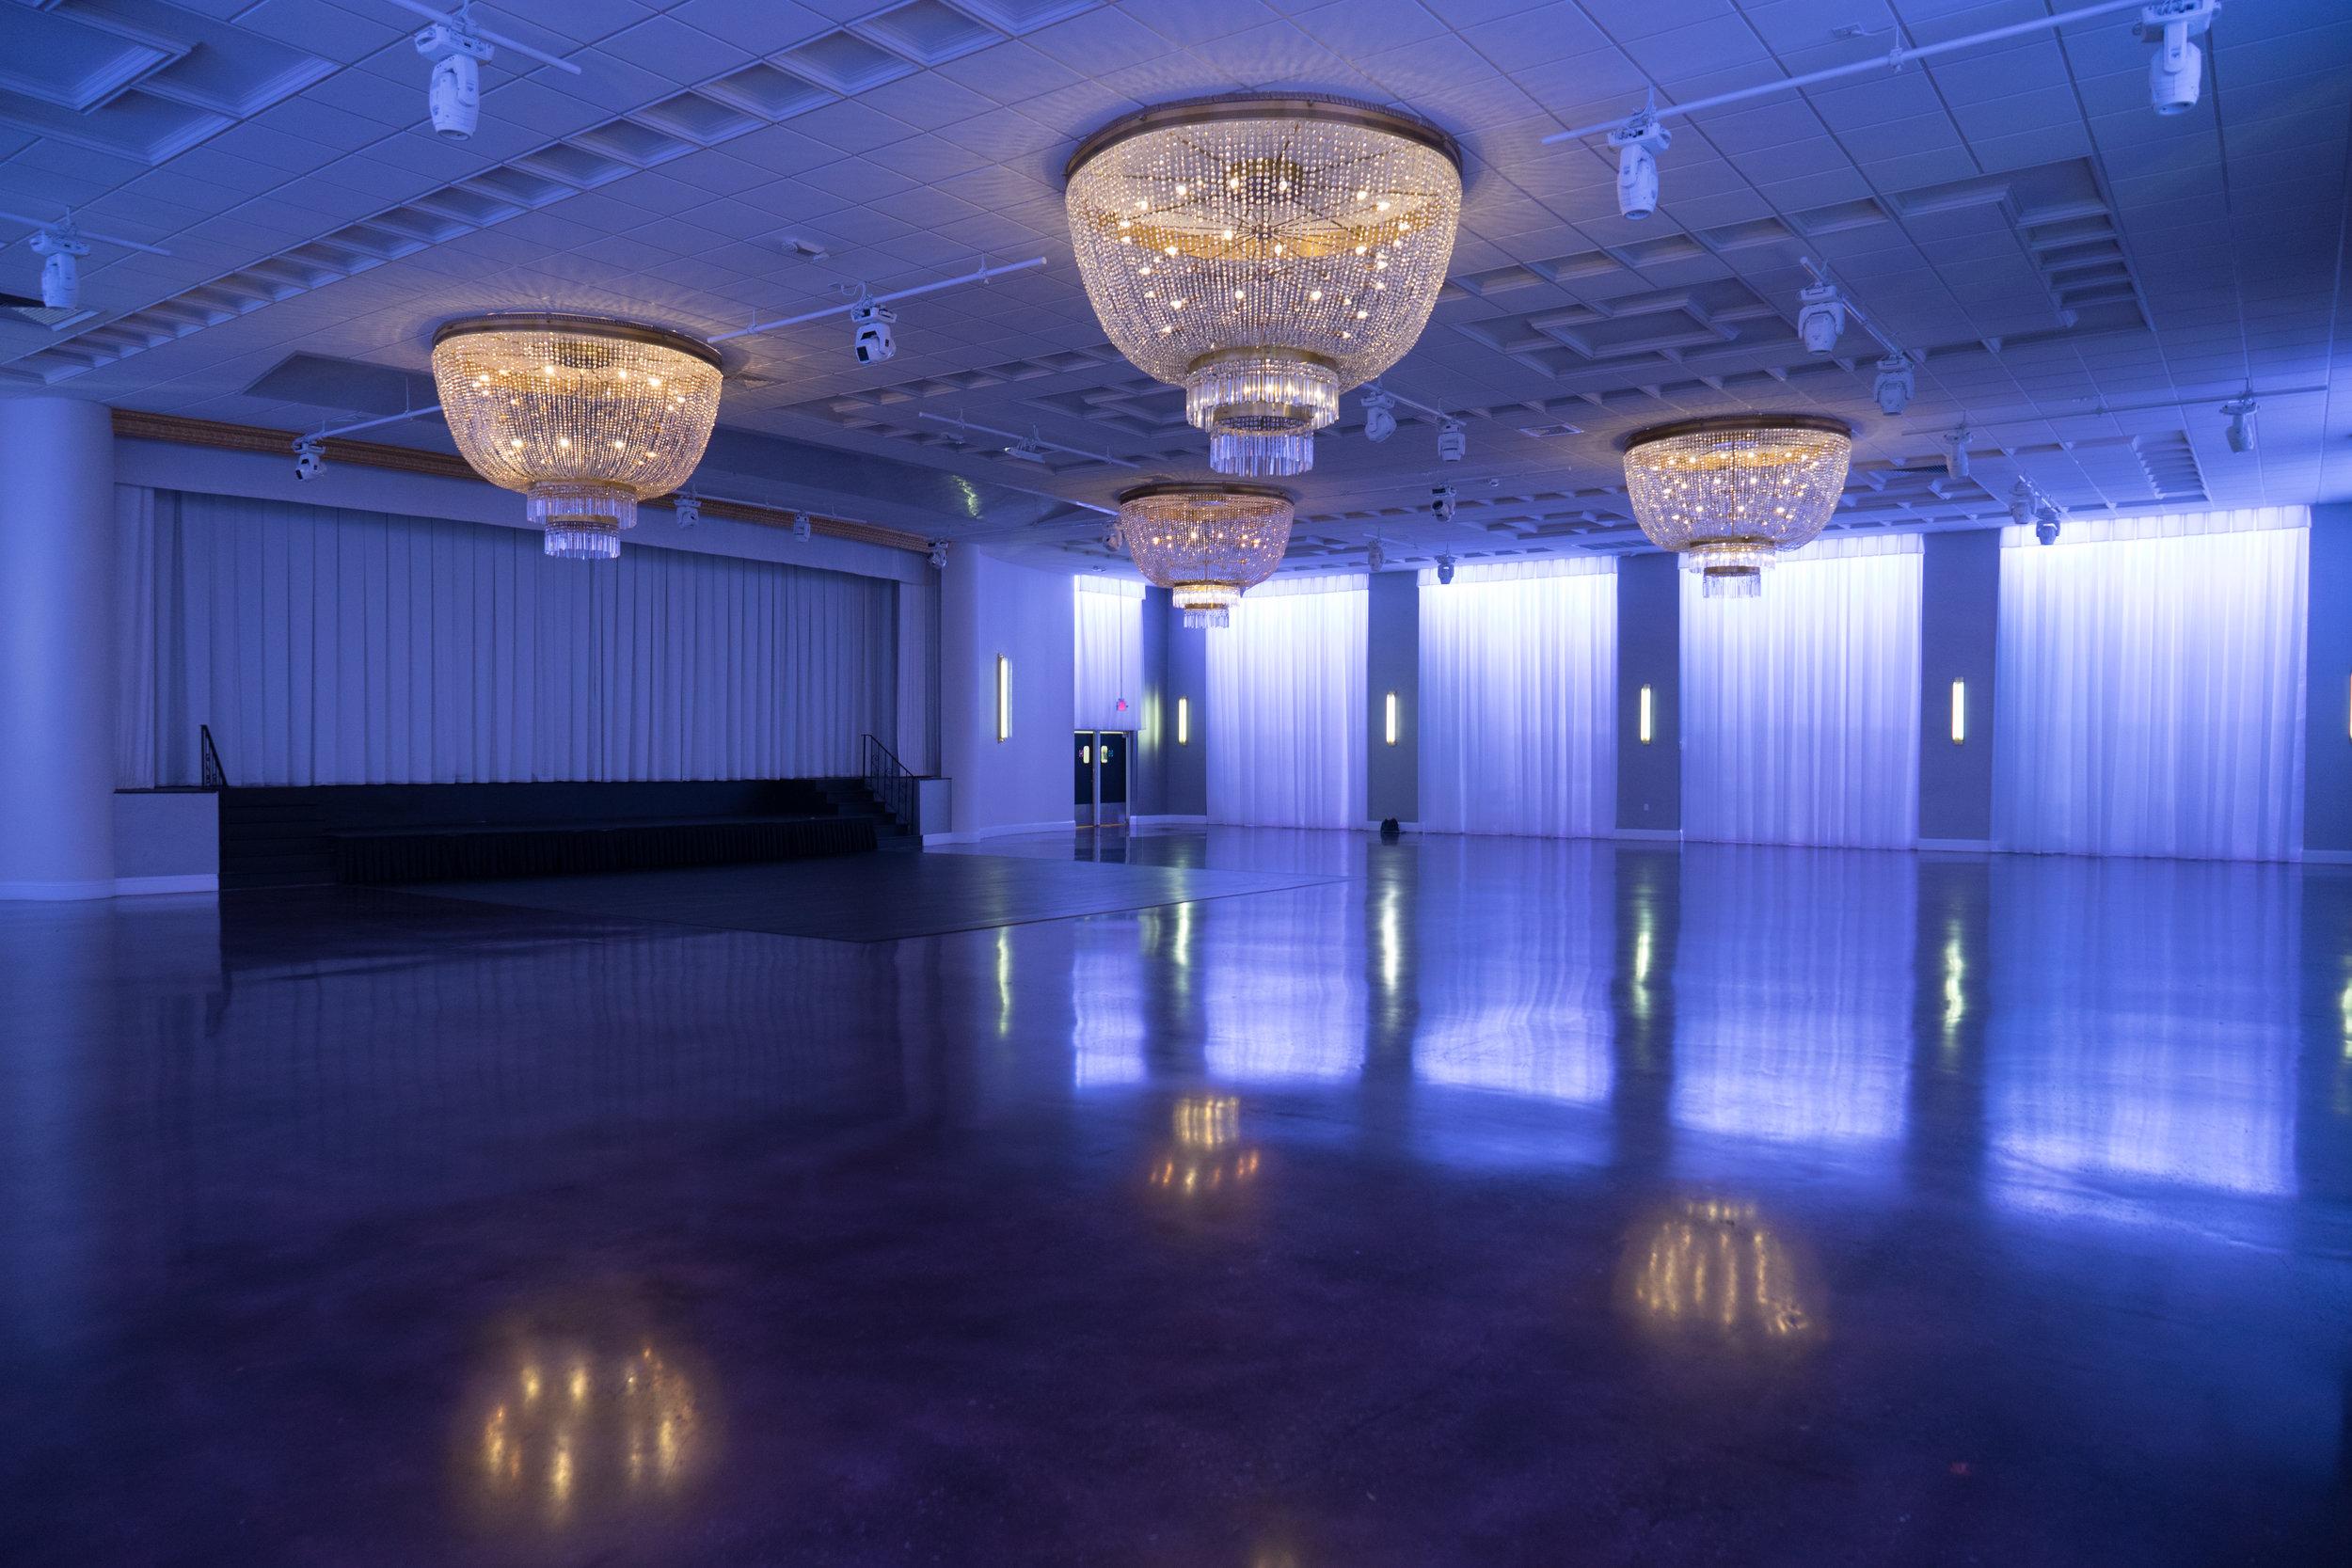 Miami Venue - Miami Ballroom - Luxury Event Venue.jpg